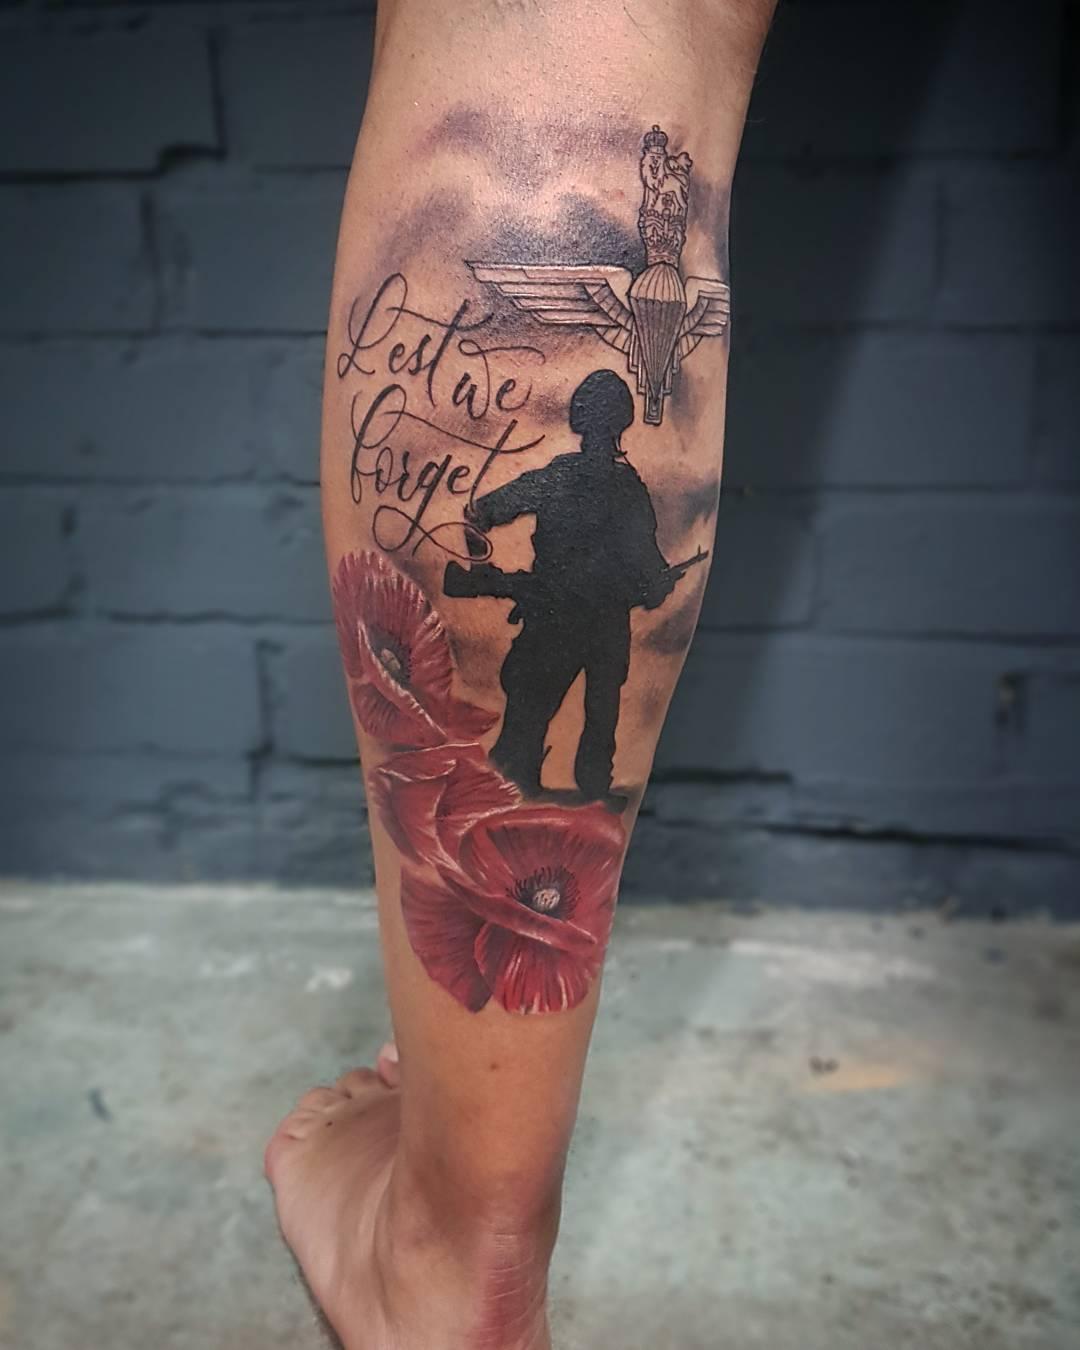 Lest We Forget Leg Tattoo